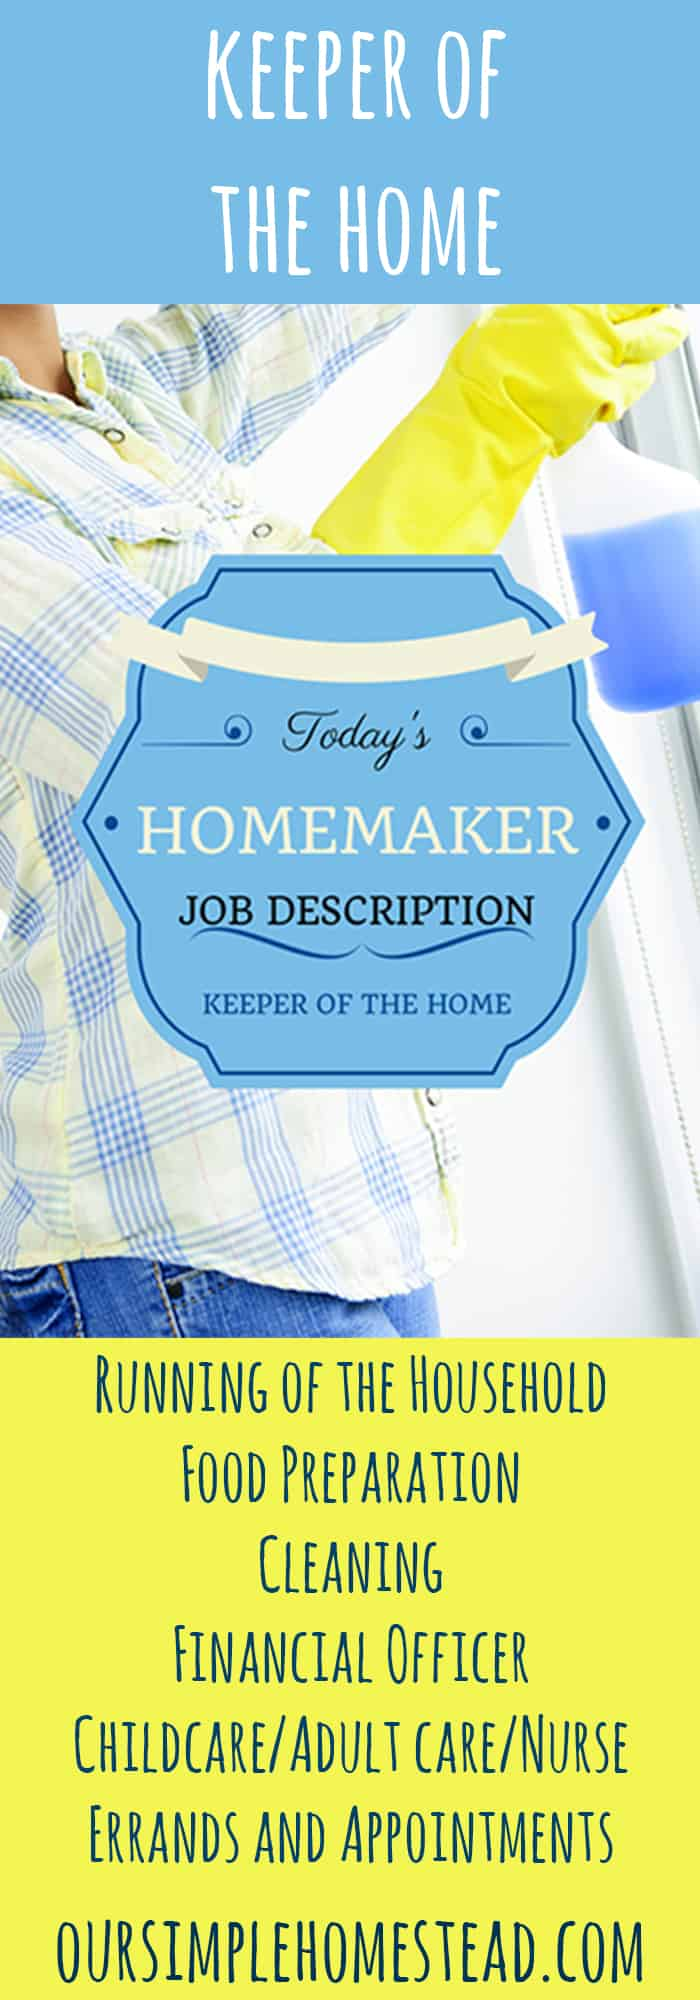 homemaker job description